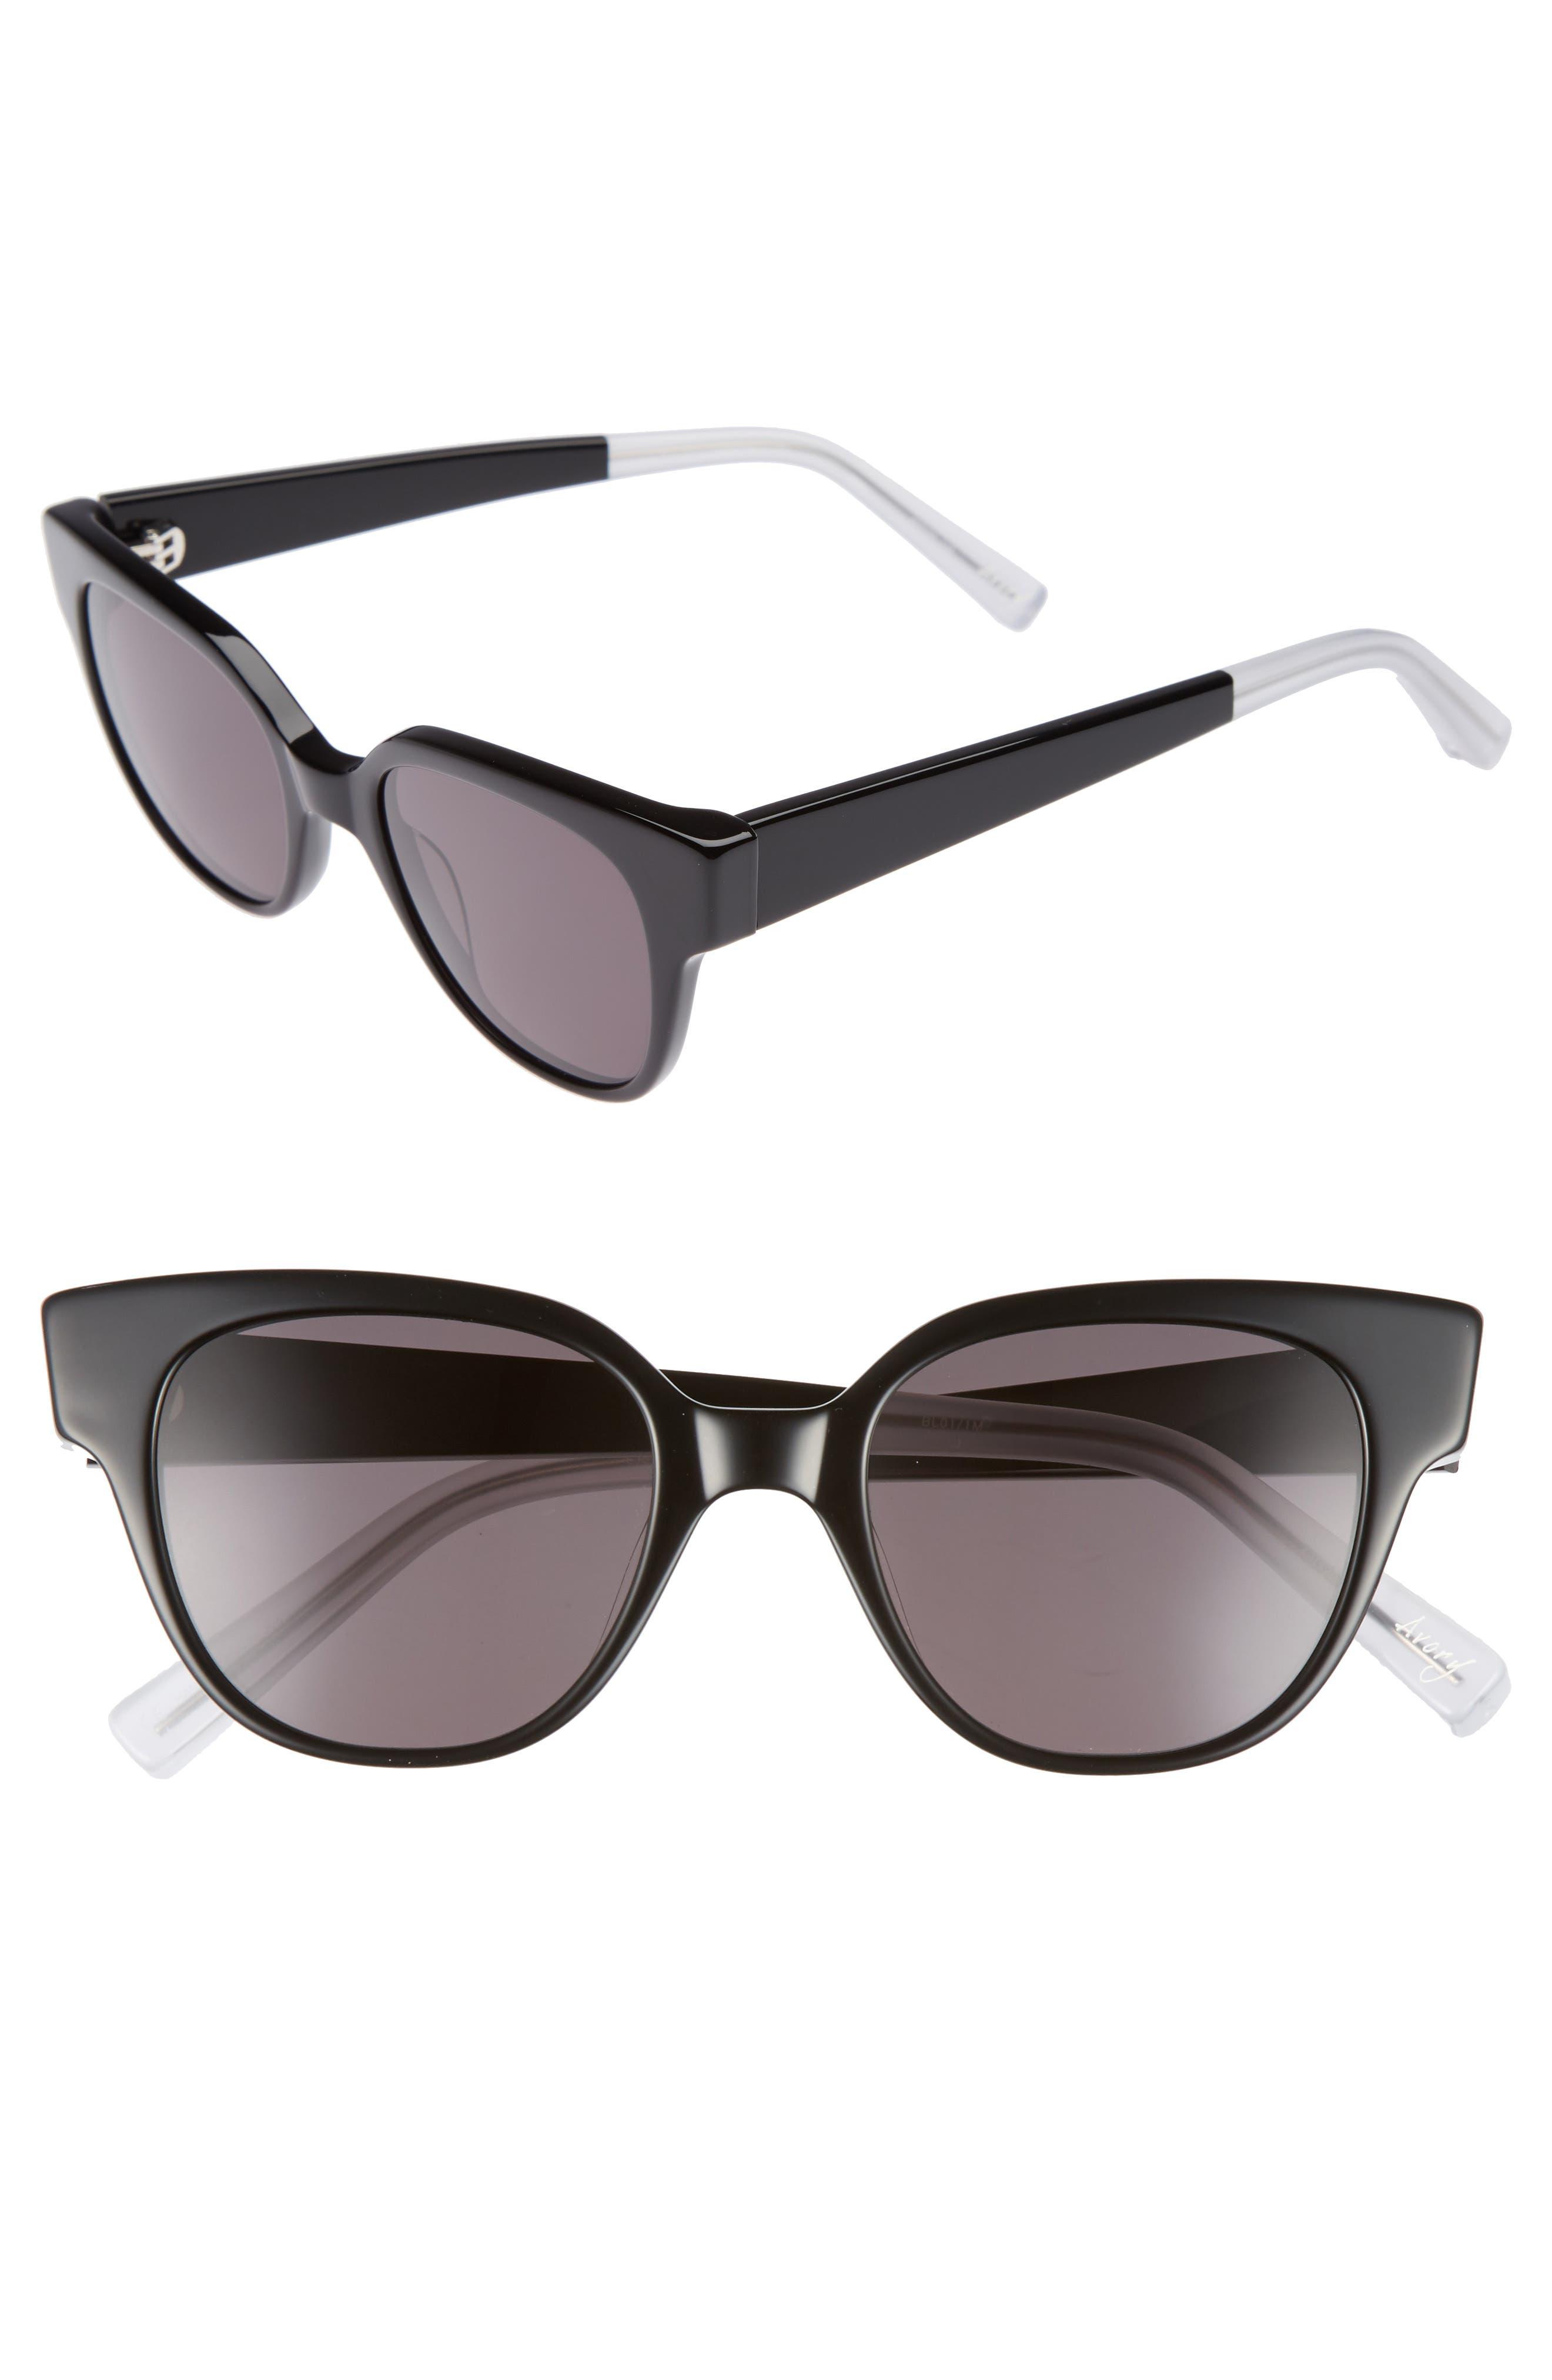 Avory 49mm Cat Eye Sunglasses,                             Main thumbnail 1, color,